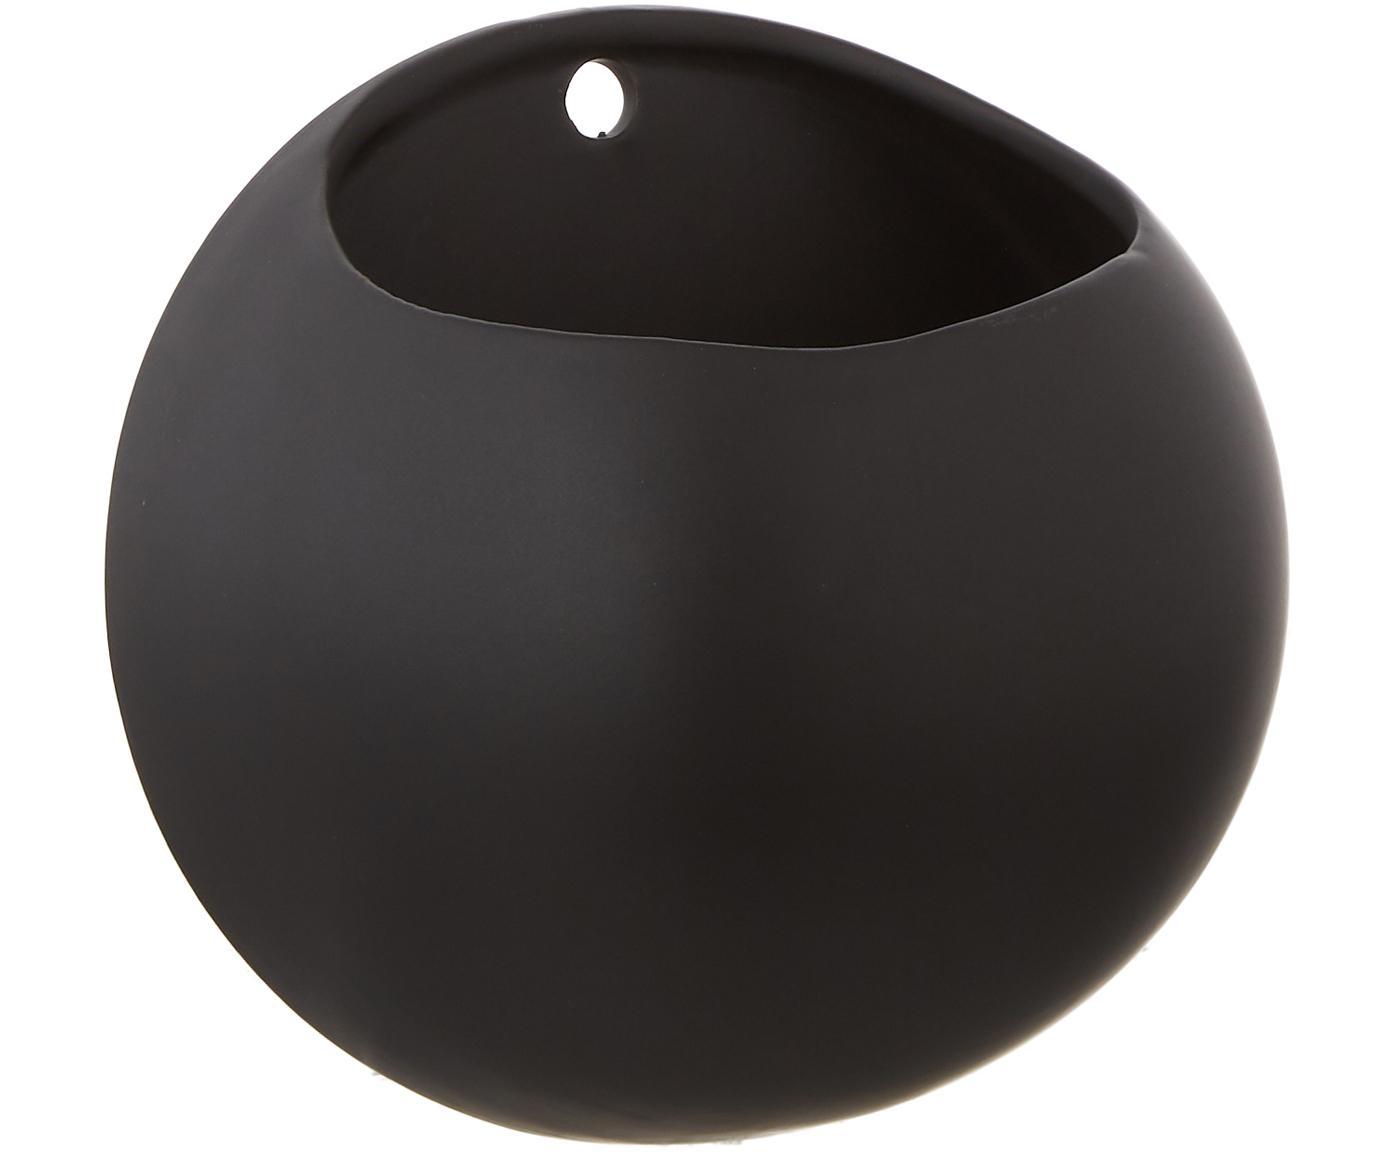 Wand-Übertopf Globe, Keramik, Schwarz, Ø 15 x H 15 cm